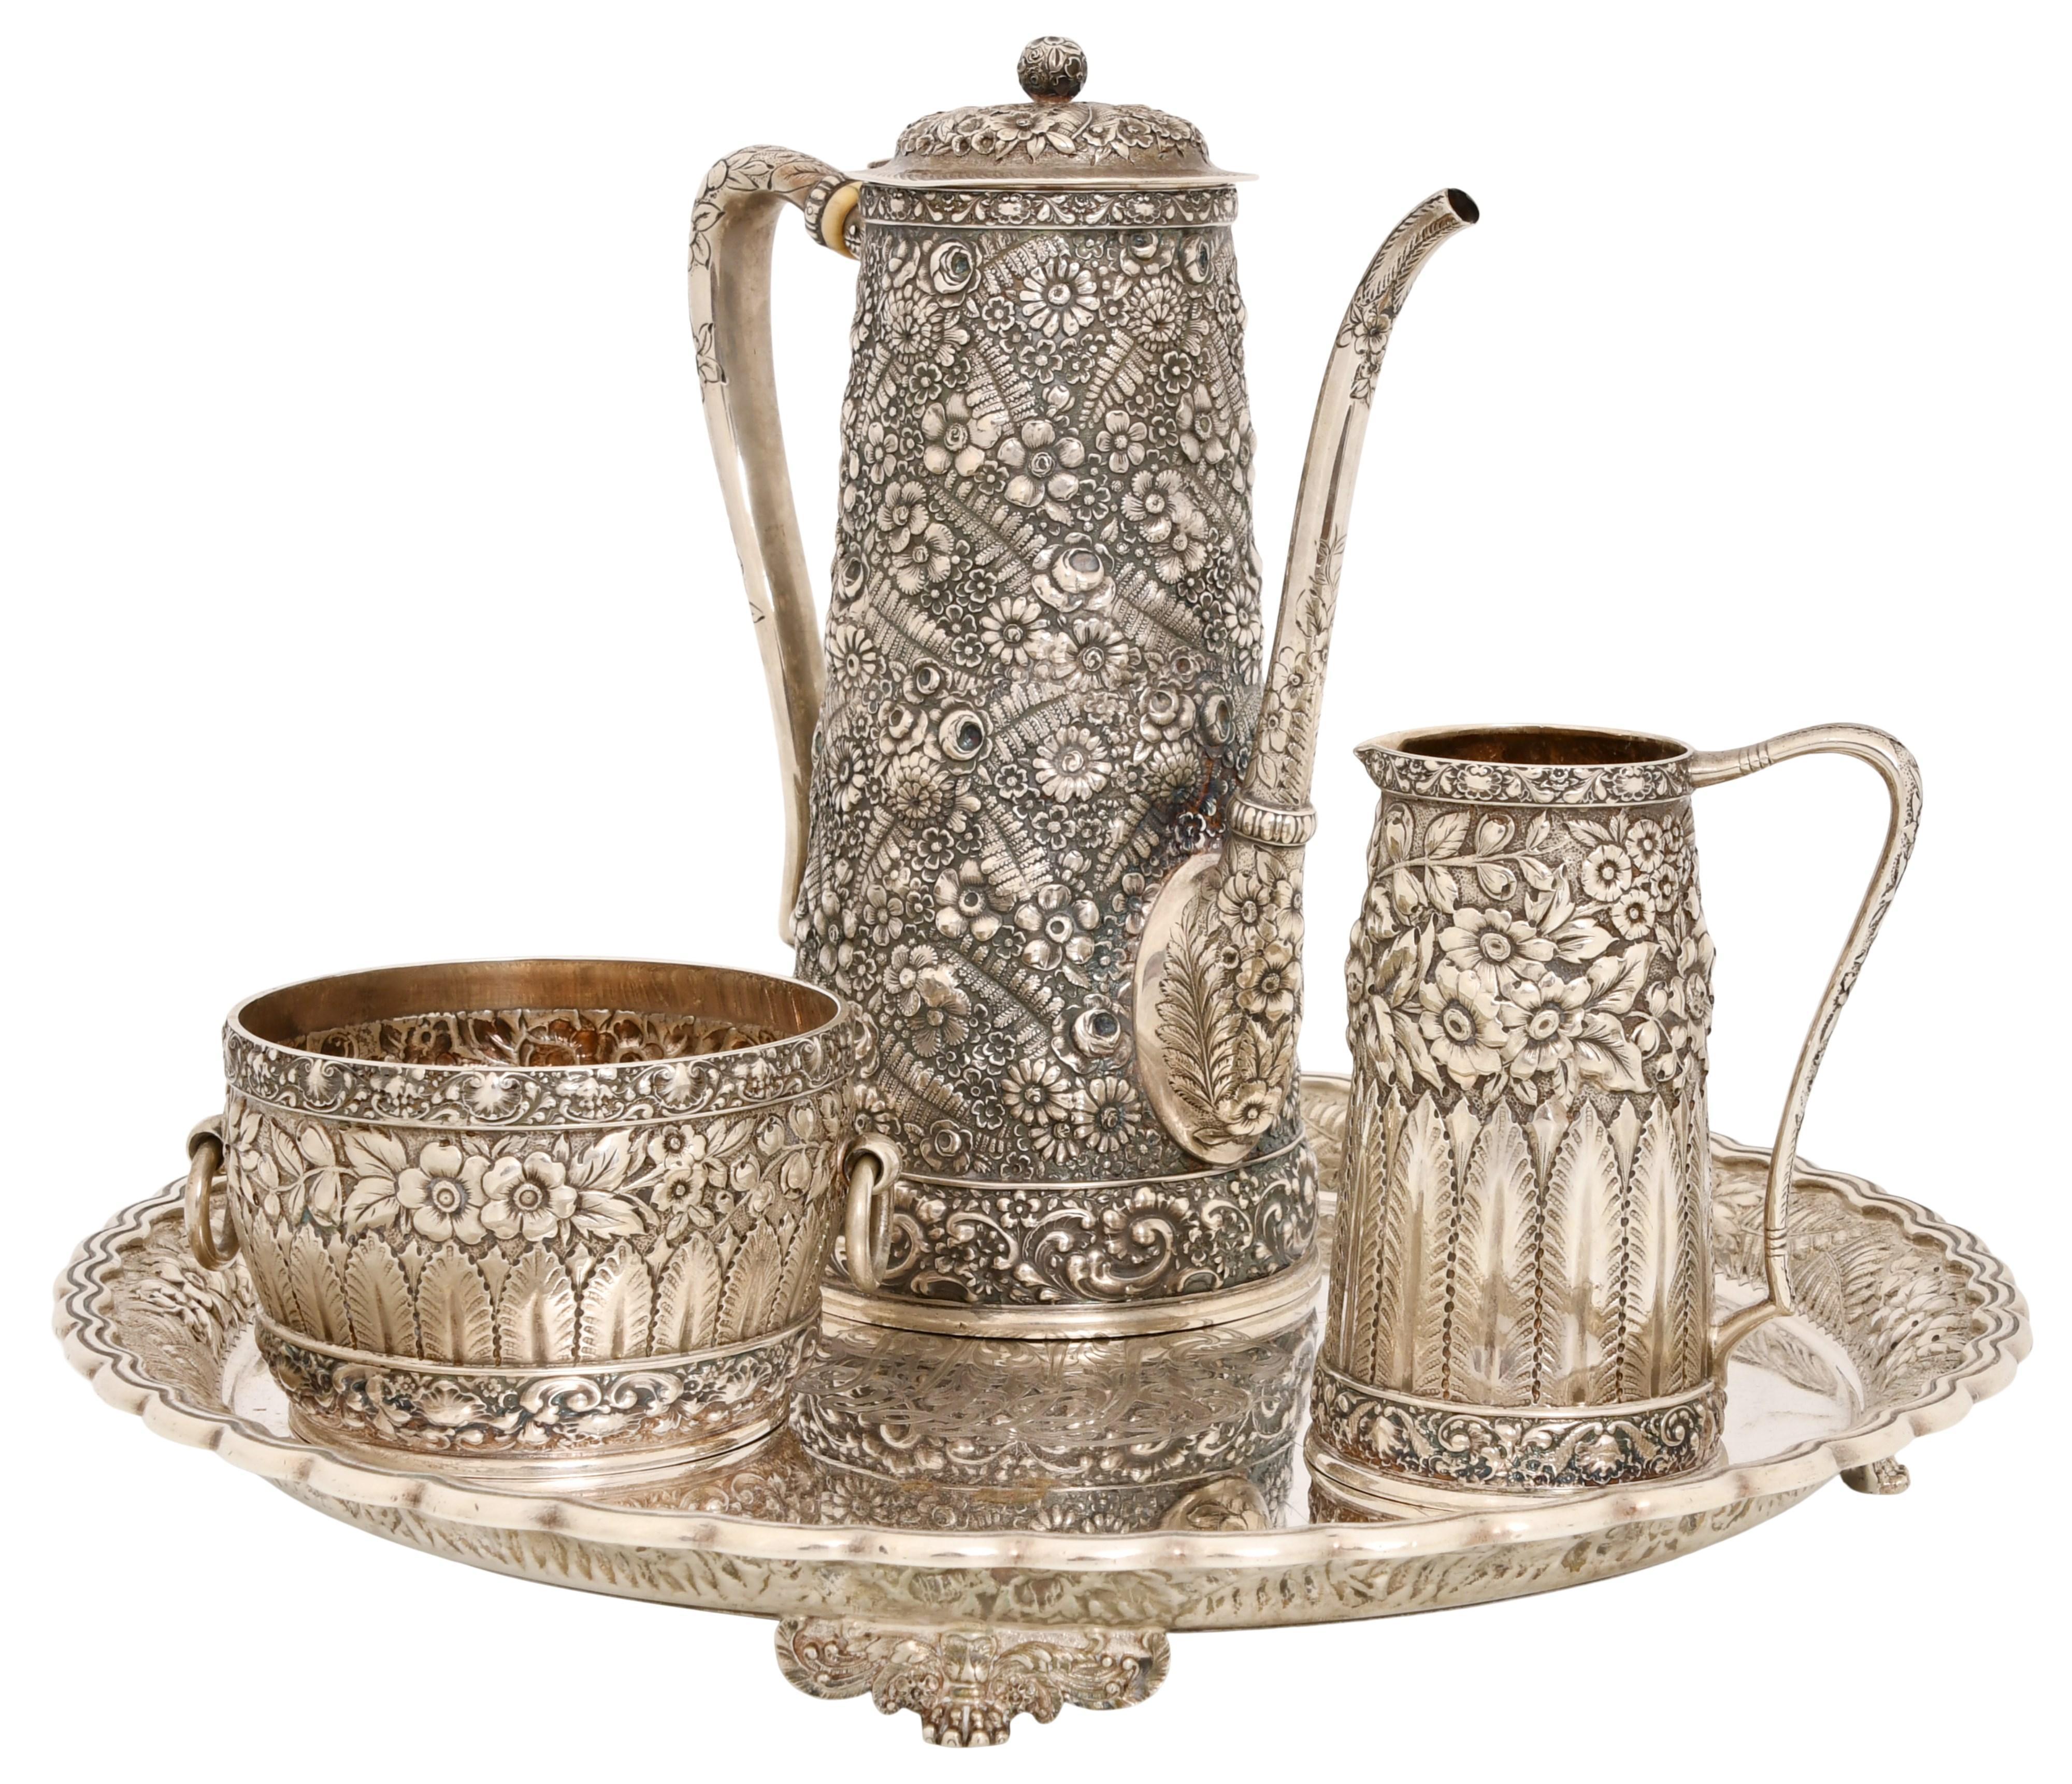 Tiffany & Co. Sterling Silver Coffee Set